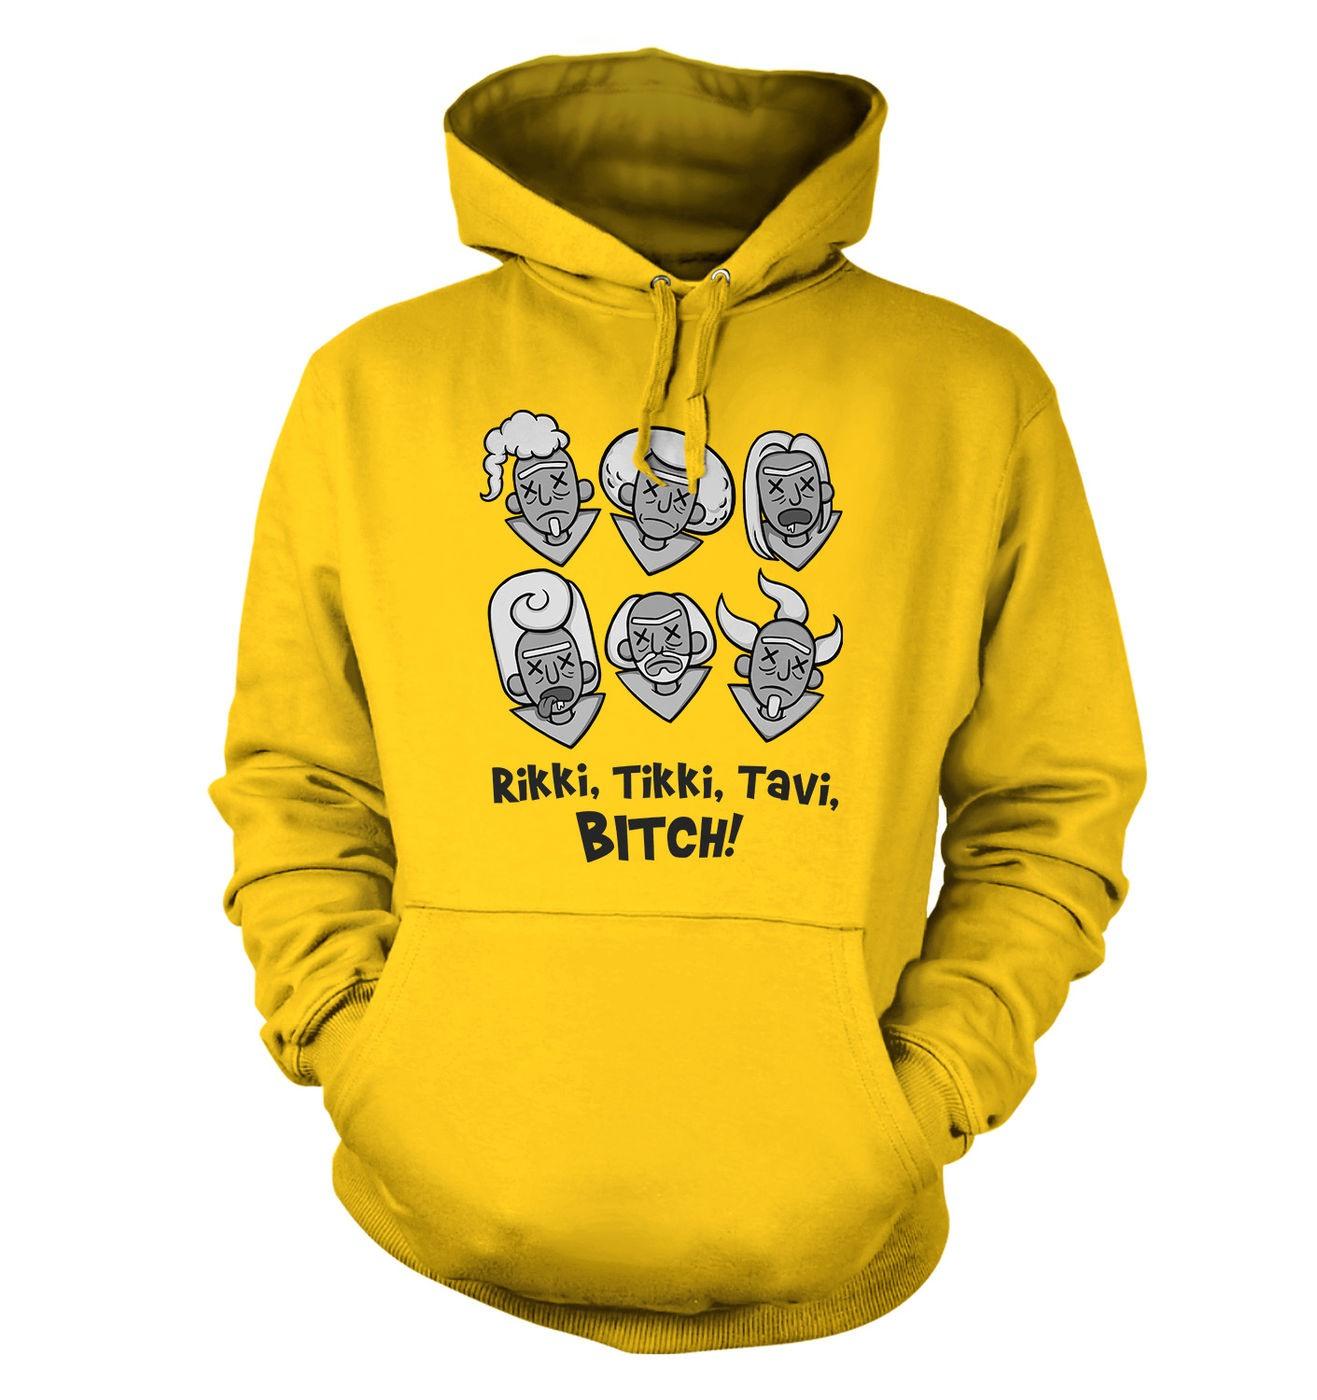 Council Of Ricks hoodie by Something Geeky